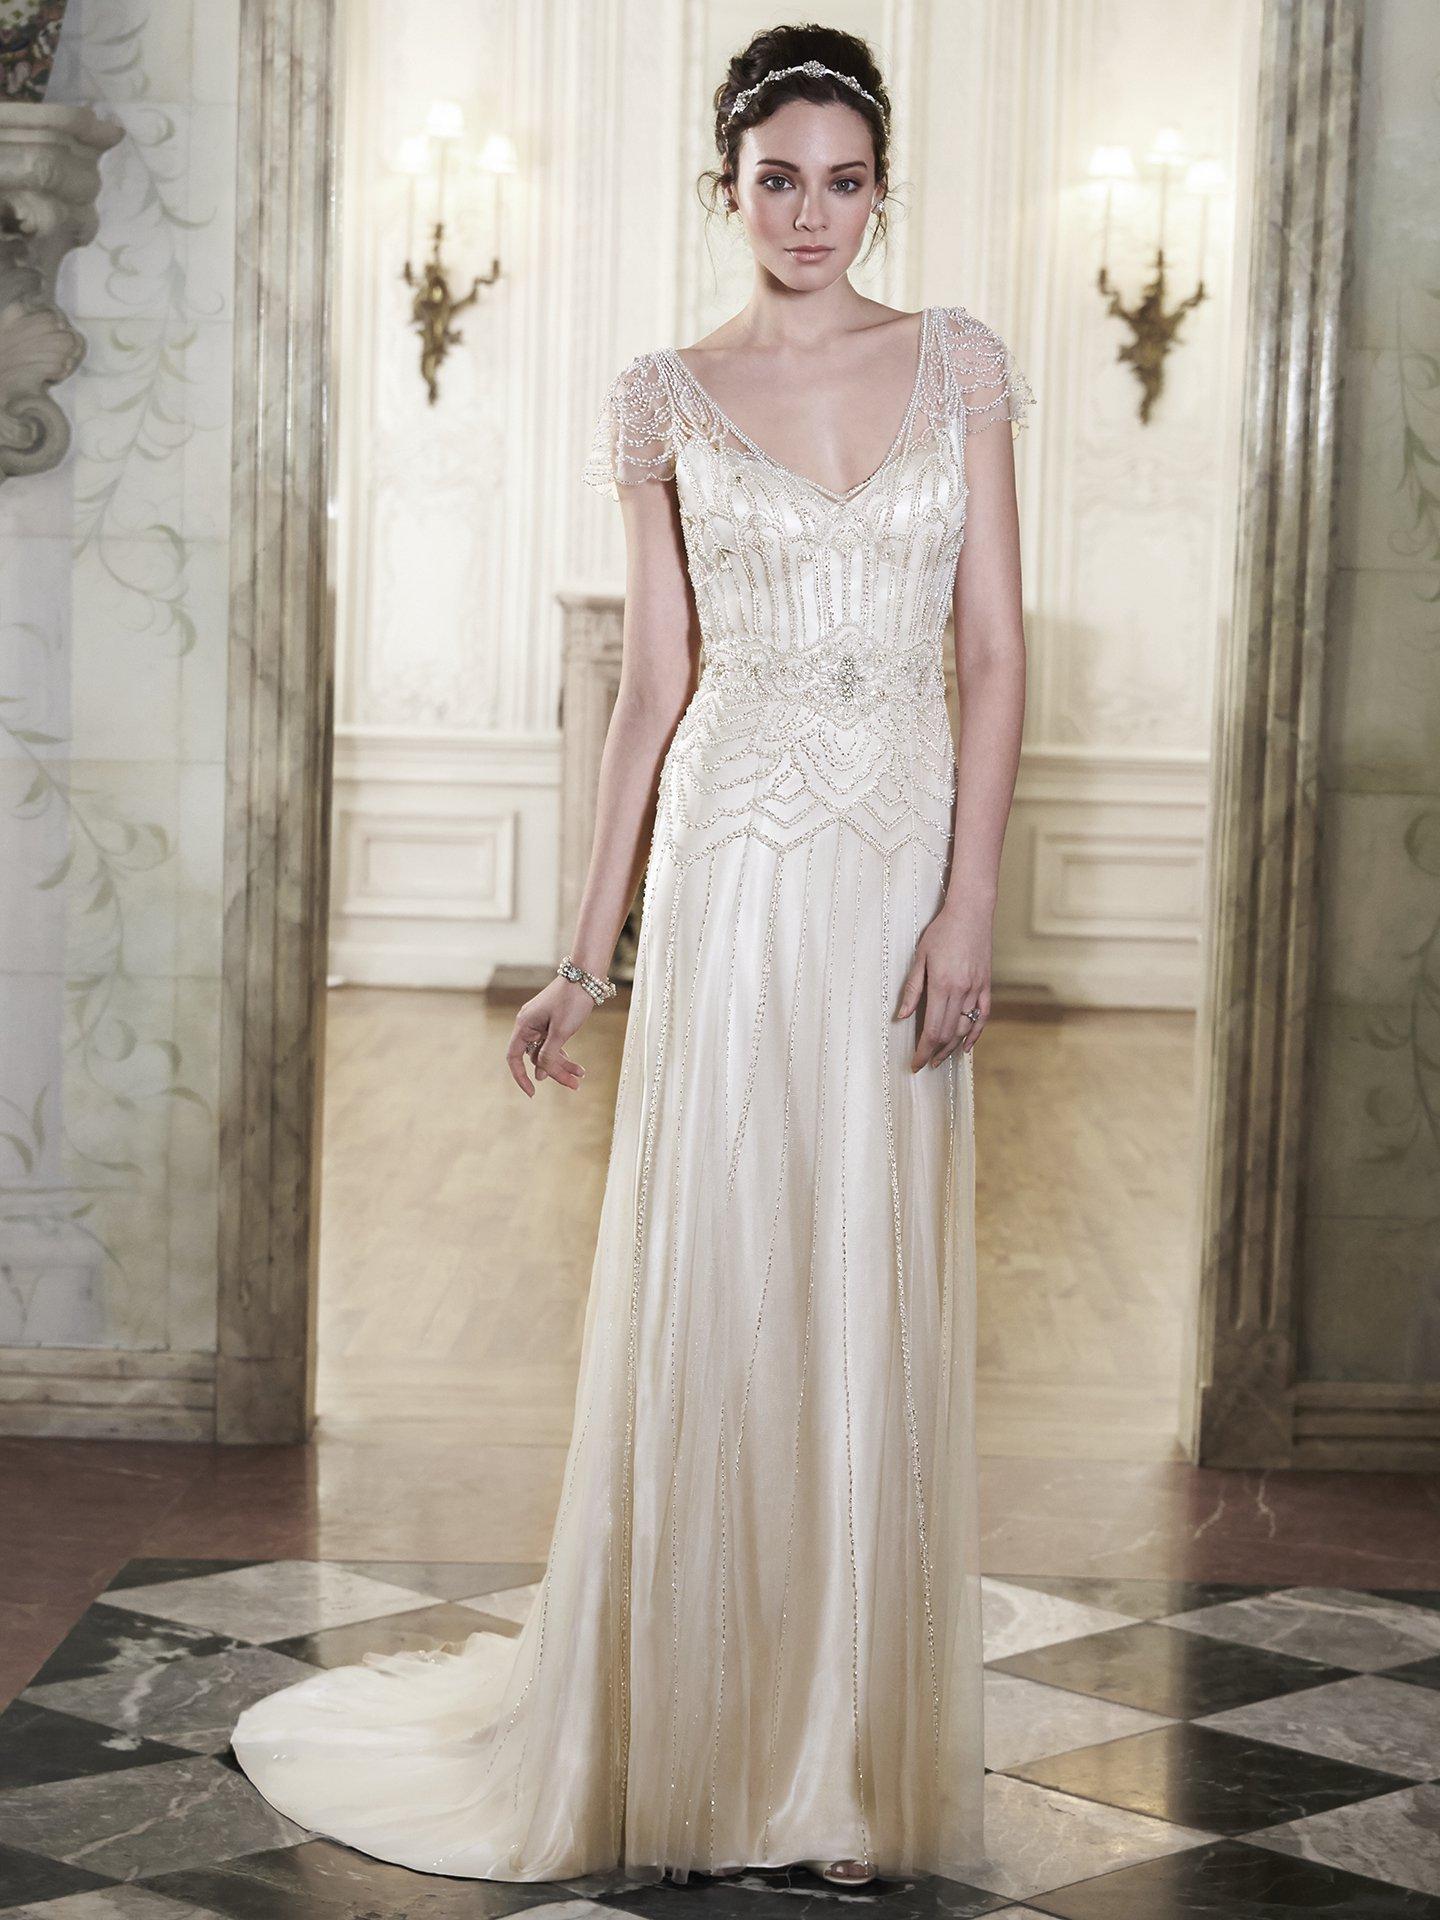 Maggie-Sottero-Wedding-Dress-Ettia-5MN084-alt2.jpg